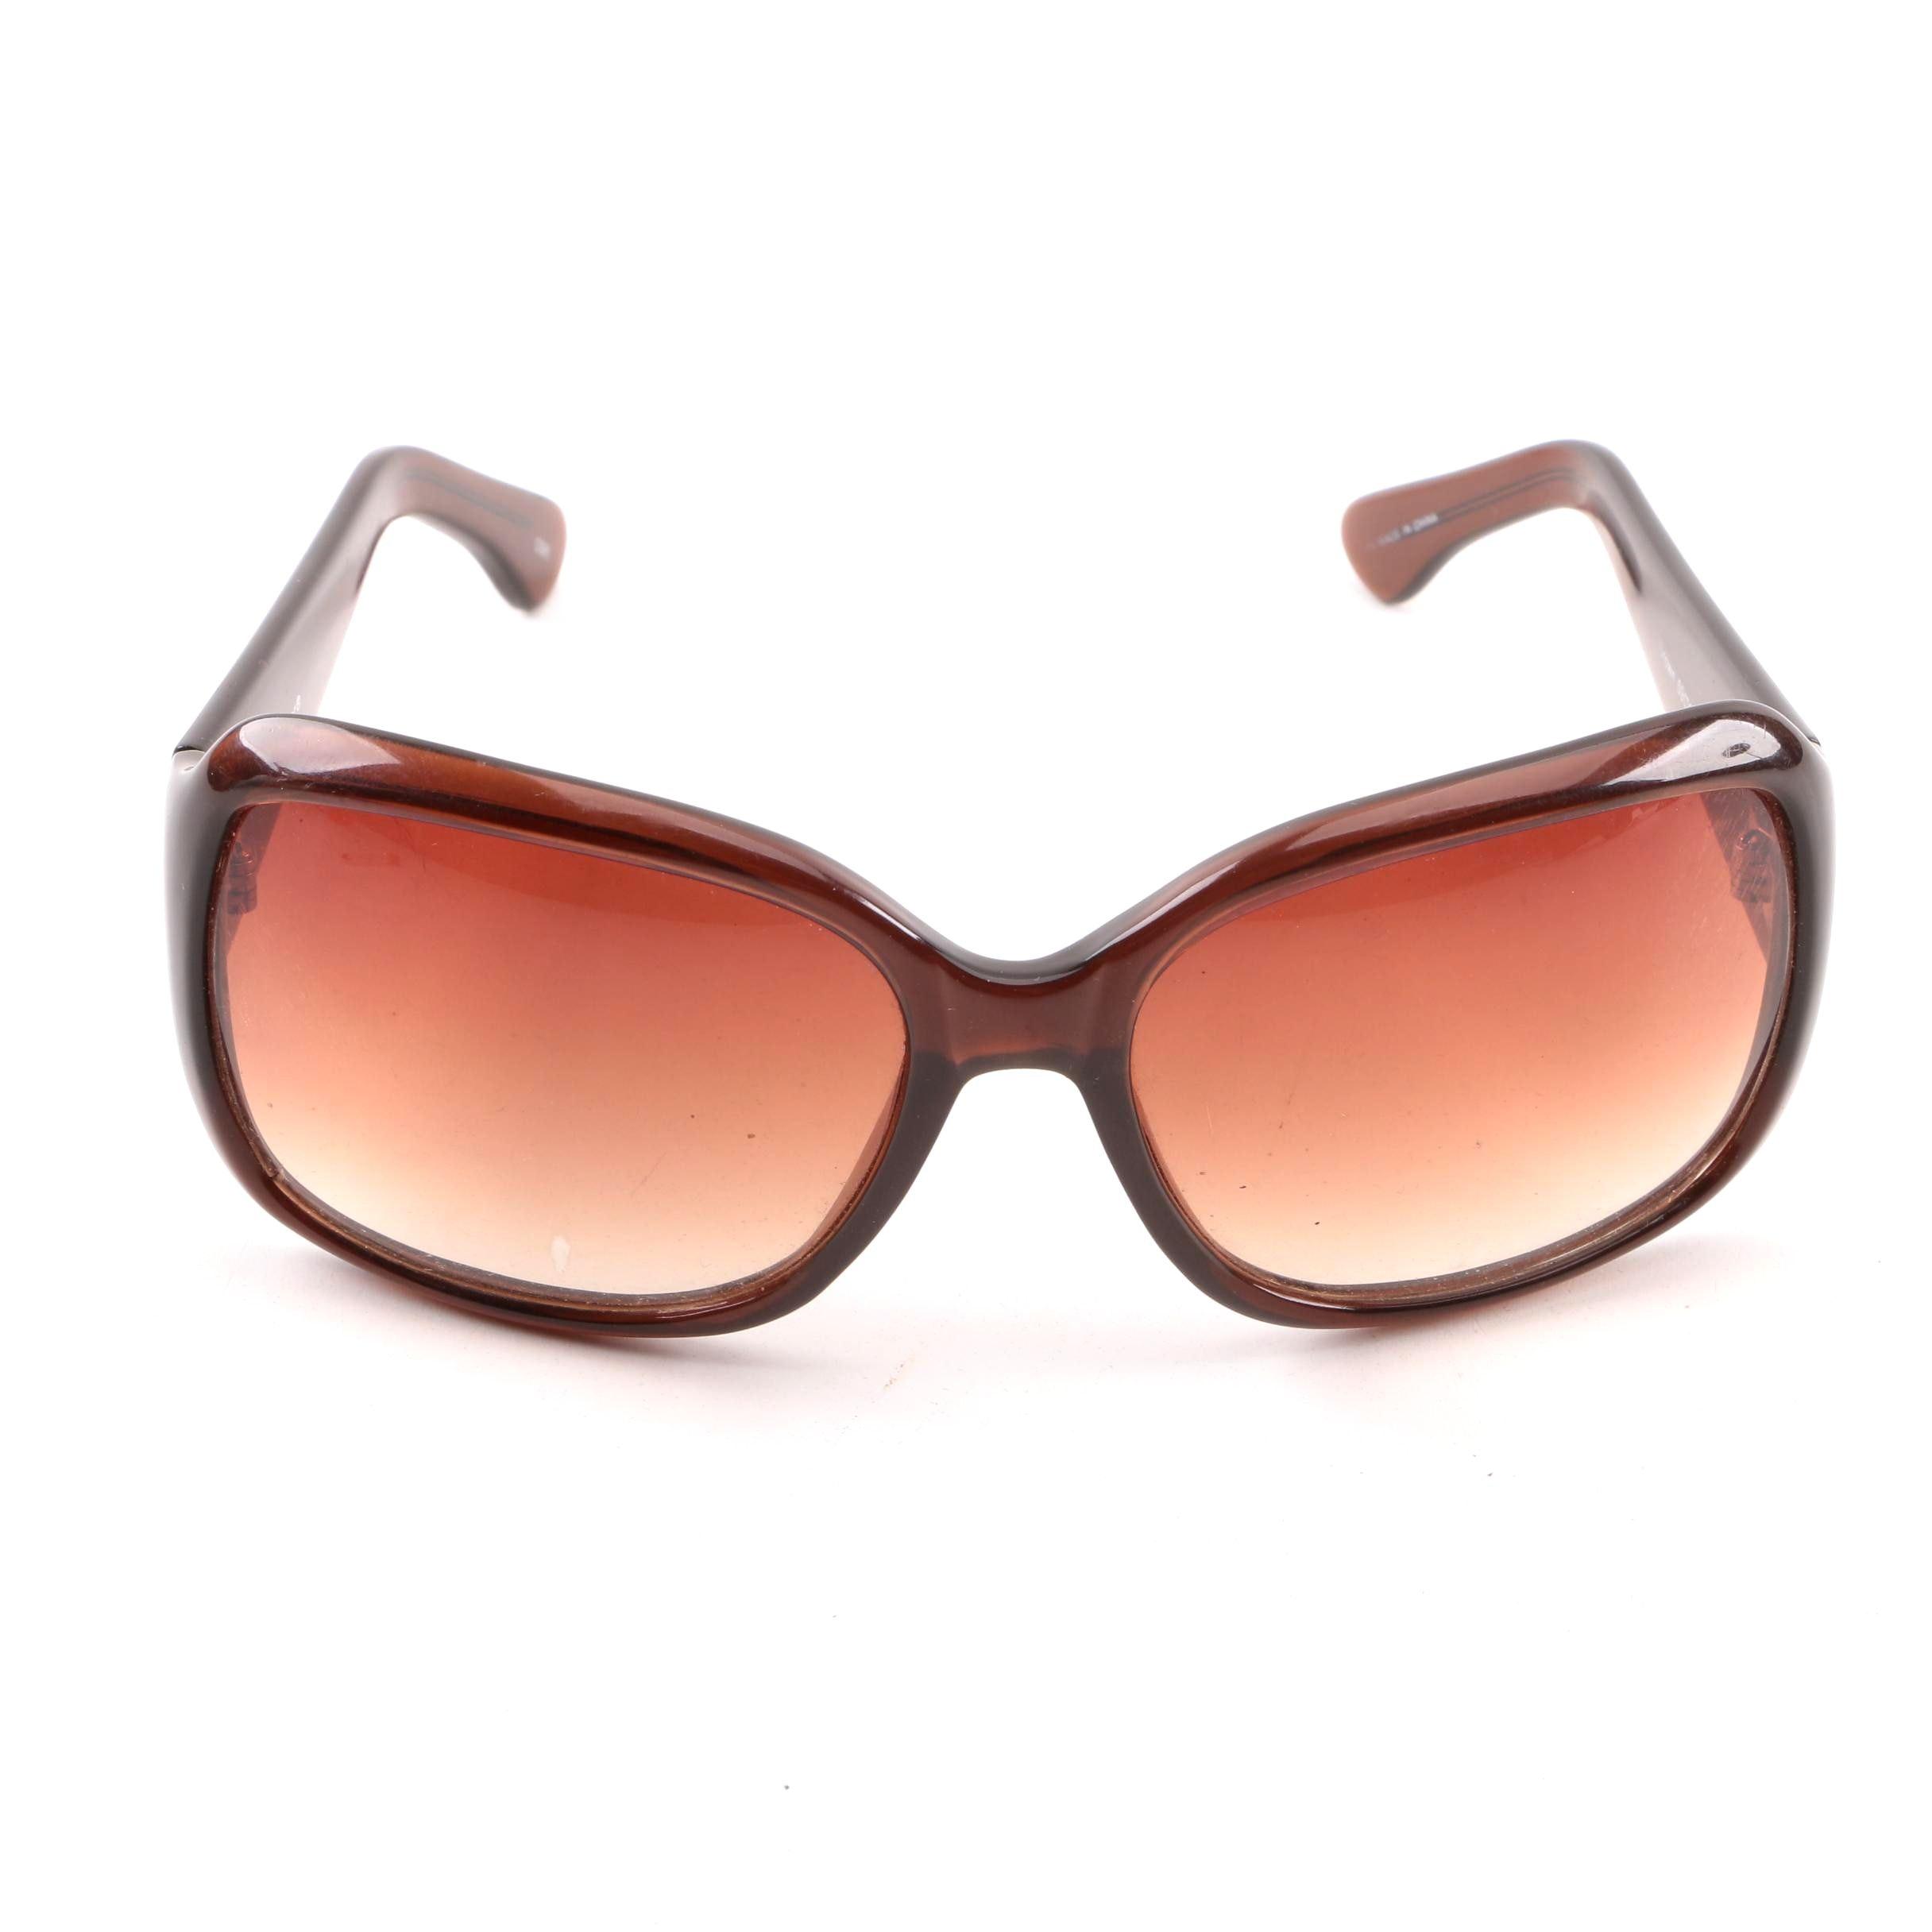 Nicole Miller Brown Wrap Style Sunglasses